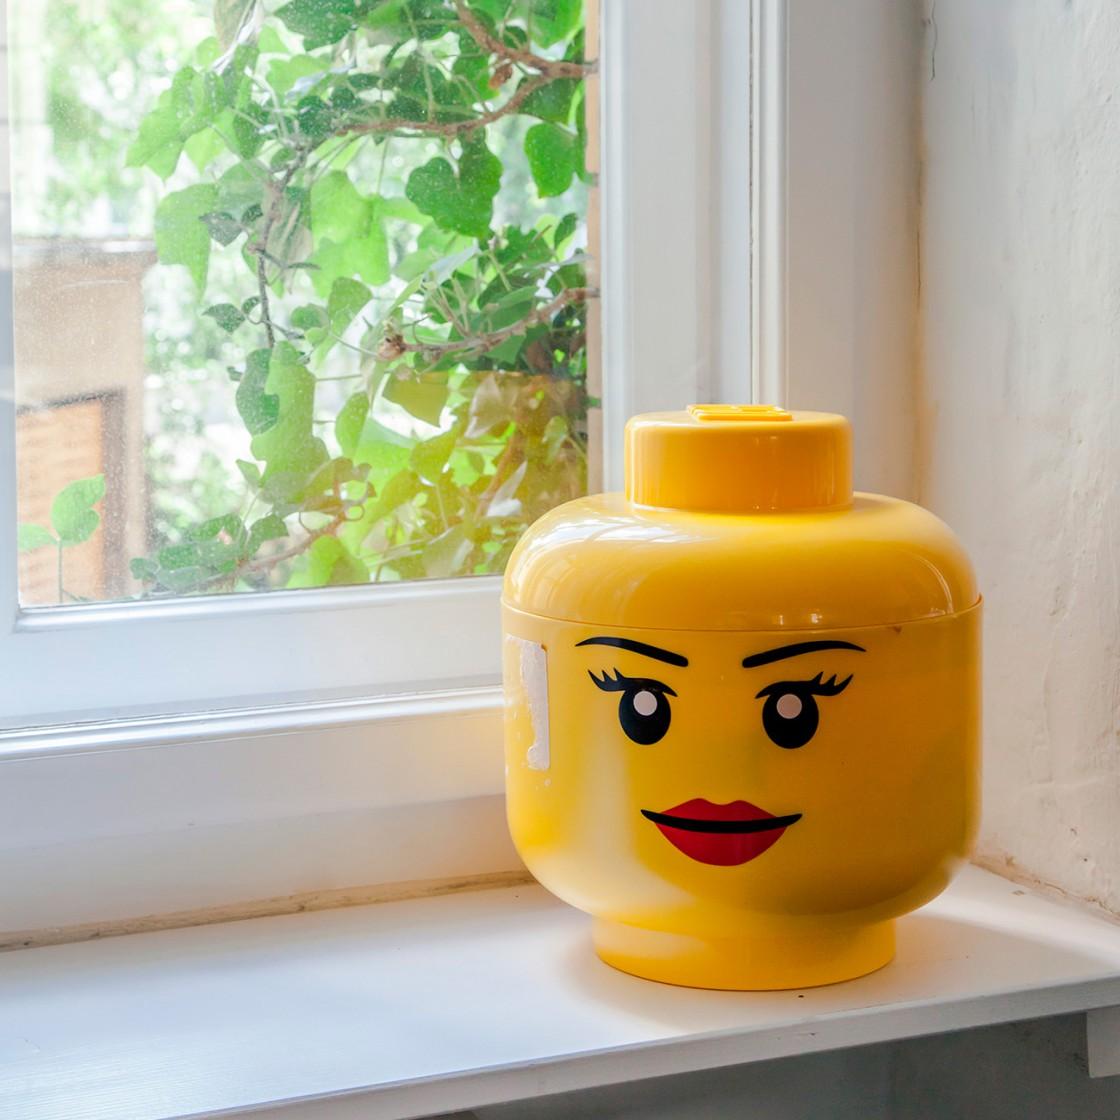 Lego-Dekoration am Fenster